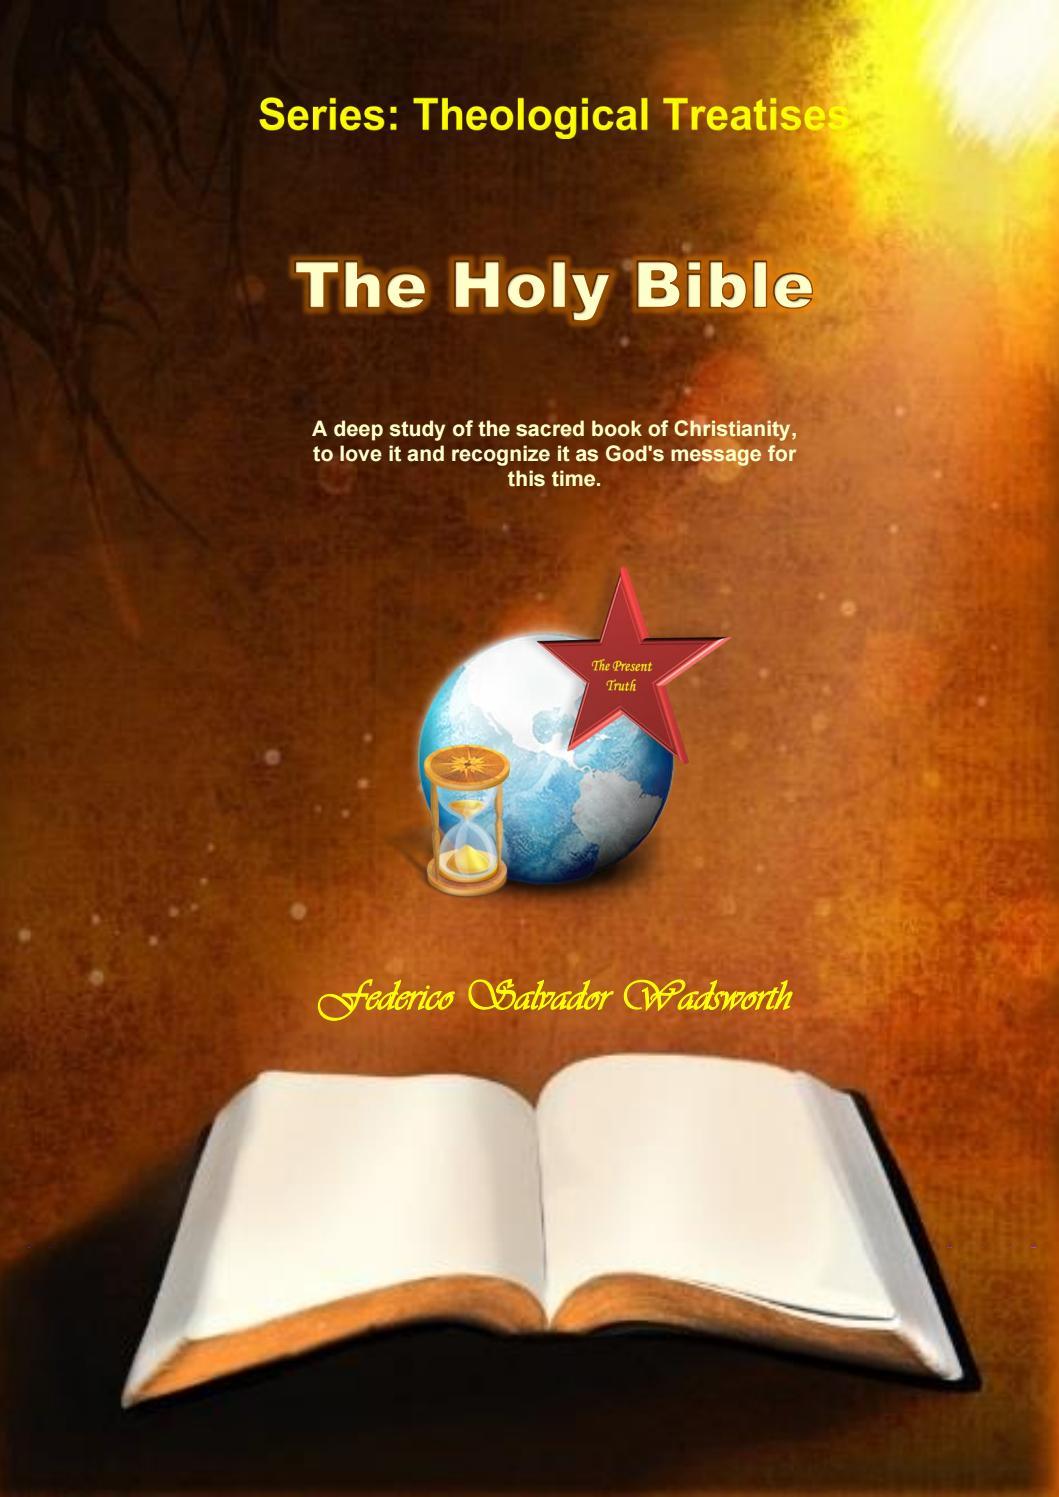 01 The Holy Bible 20 01 27 By Federicopedroalejandrosalvadorwadsworth Issuu